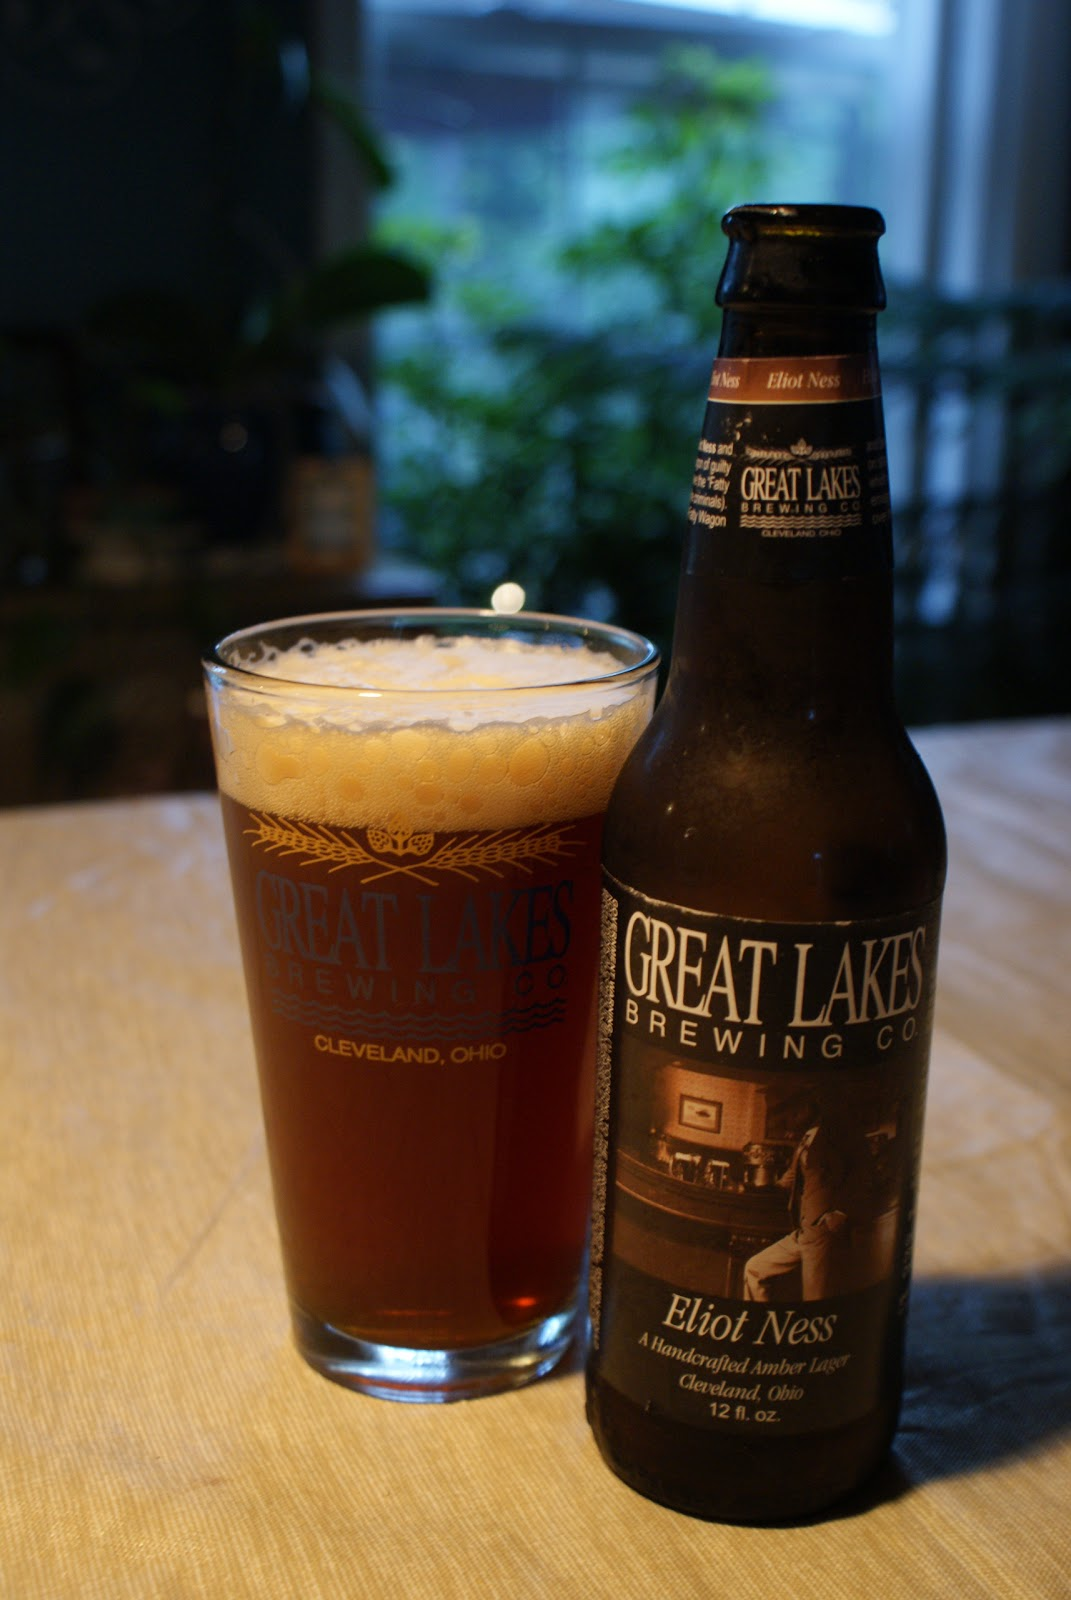 eliot ness beer - photo #10